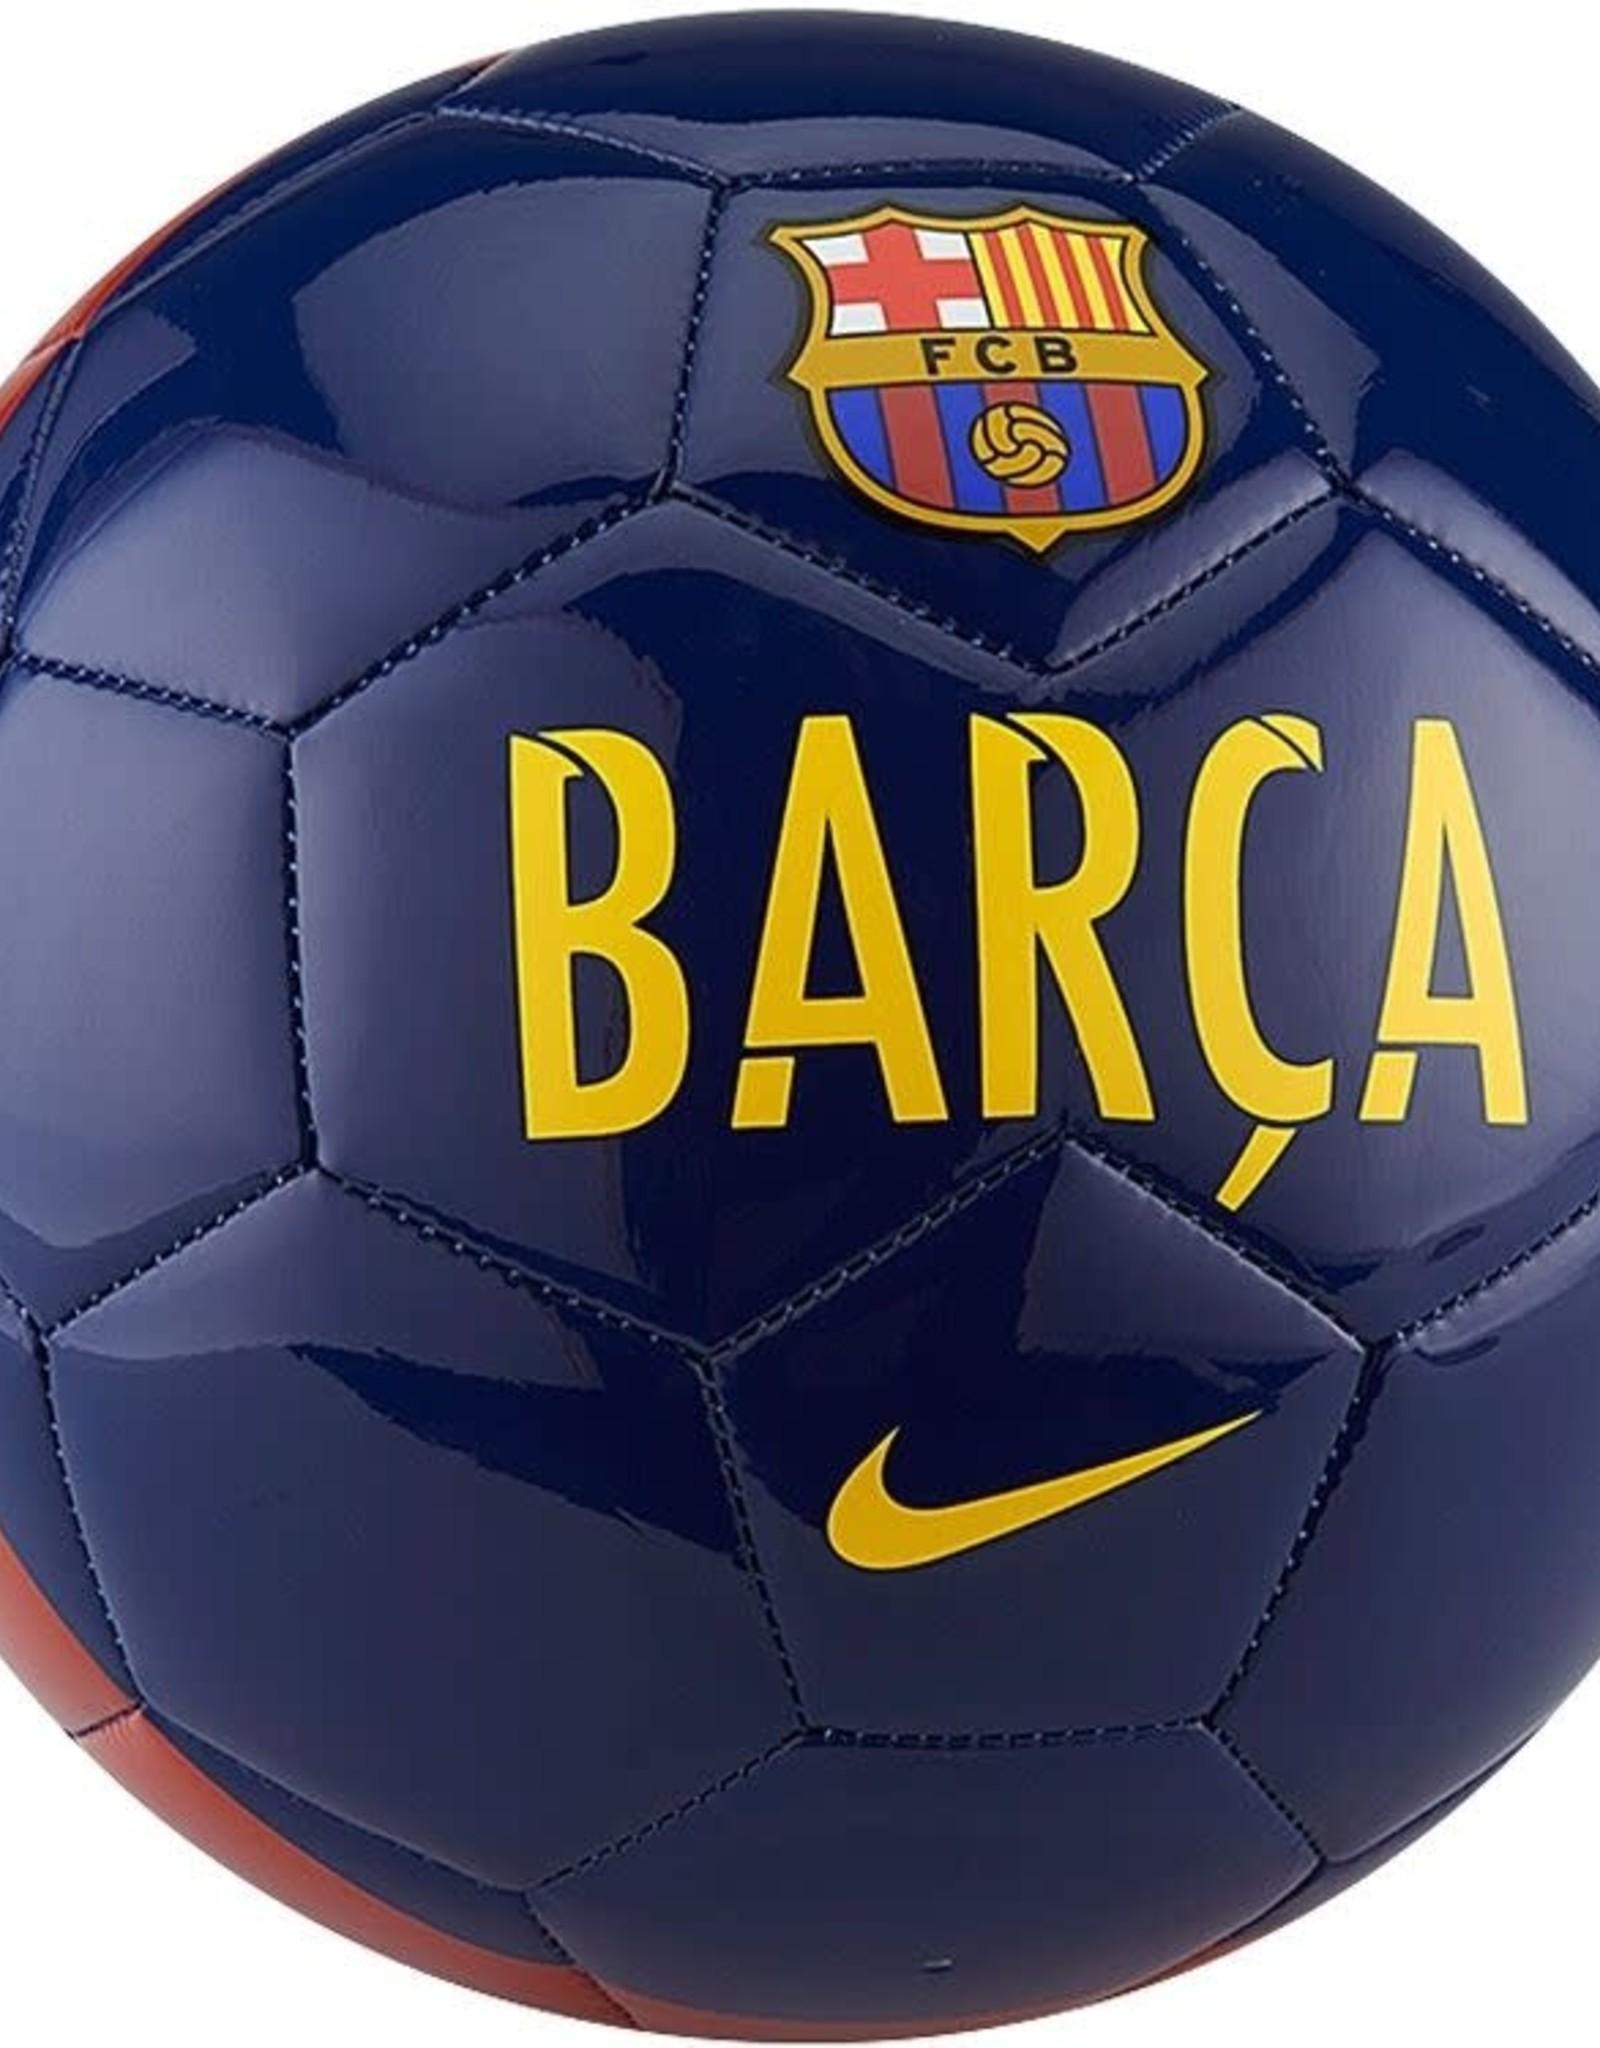 Barcelona Soccer Ball Size 3